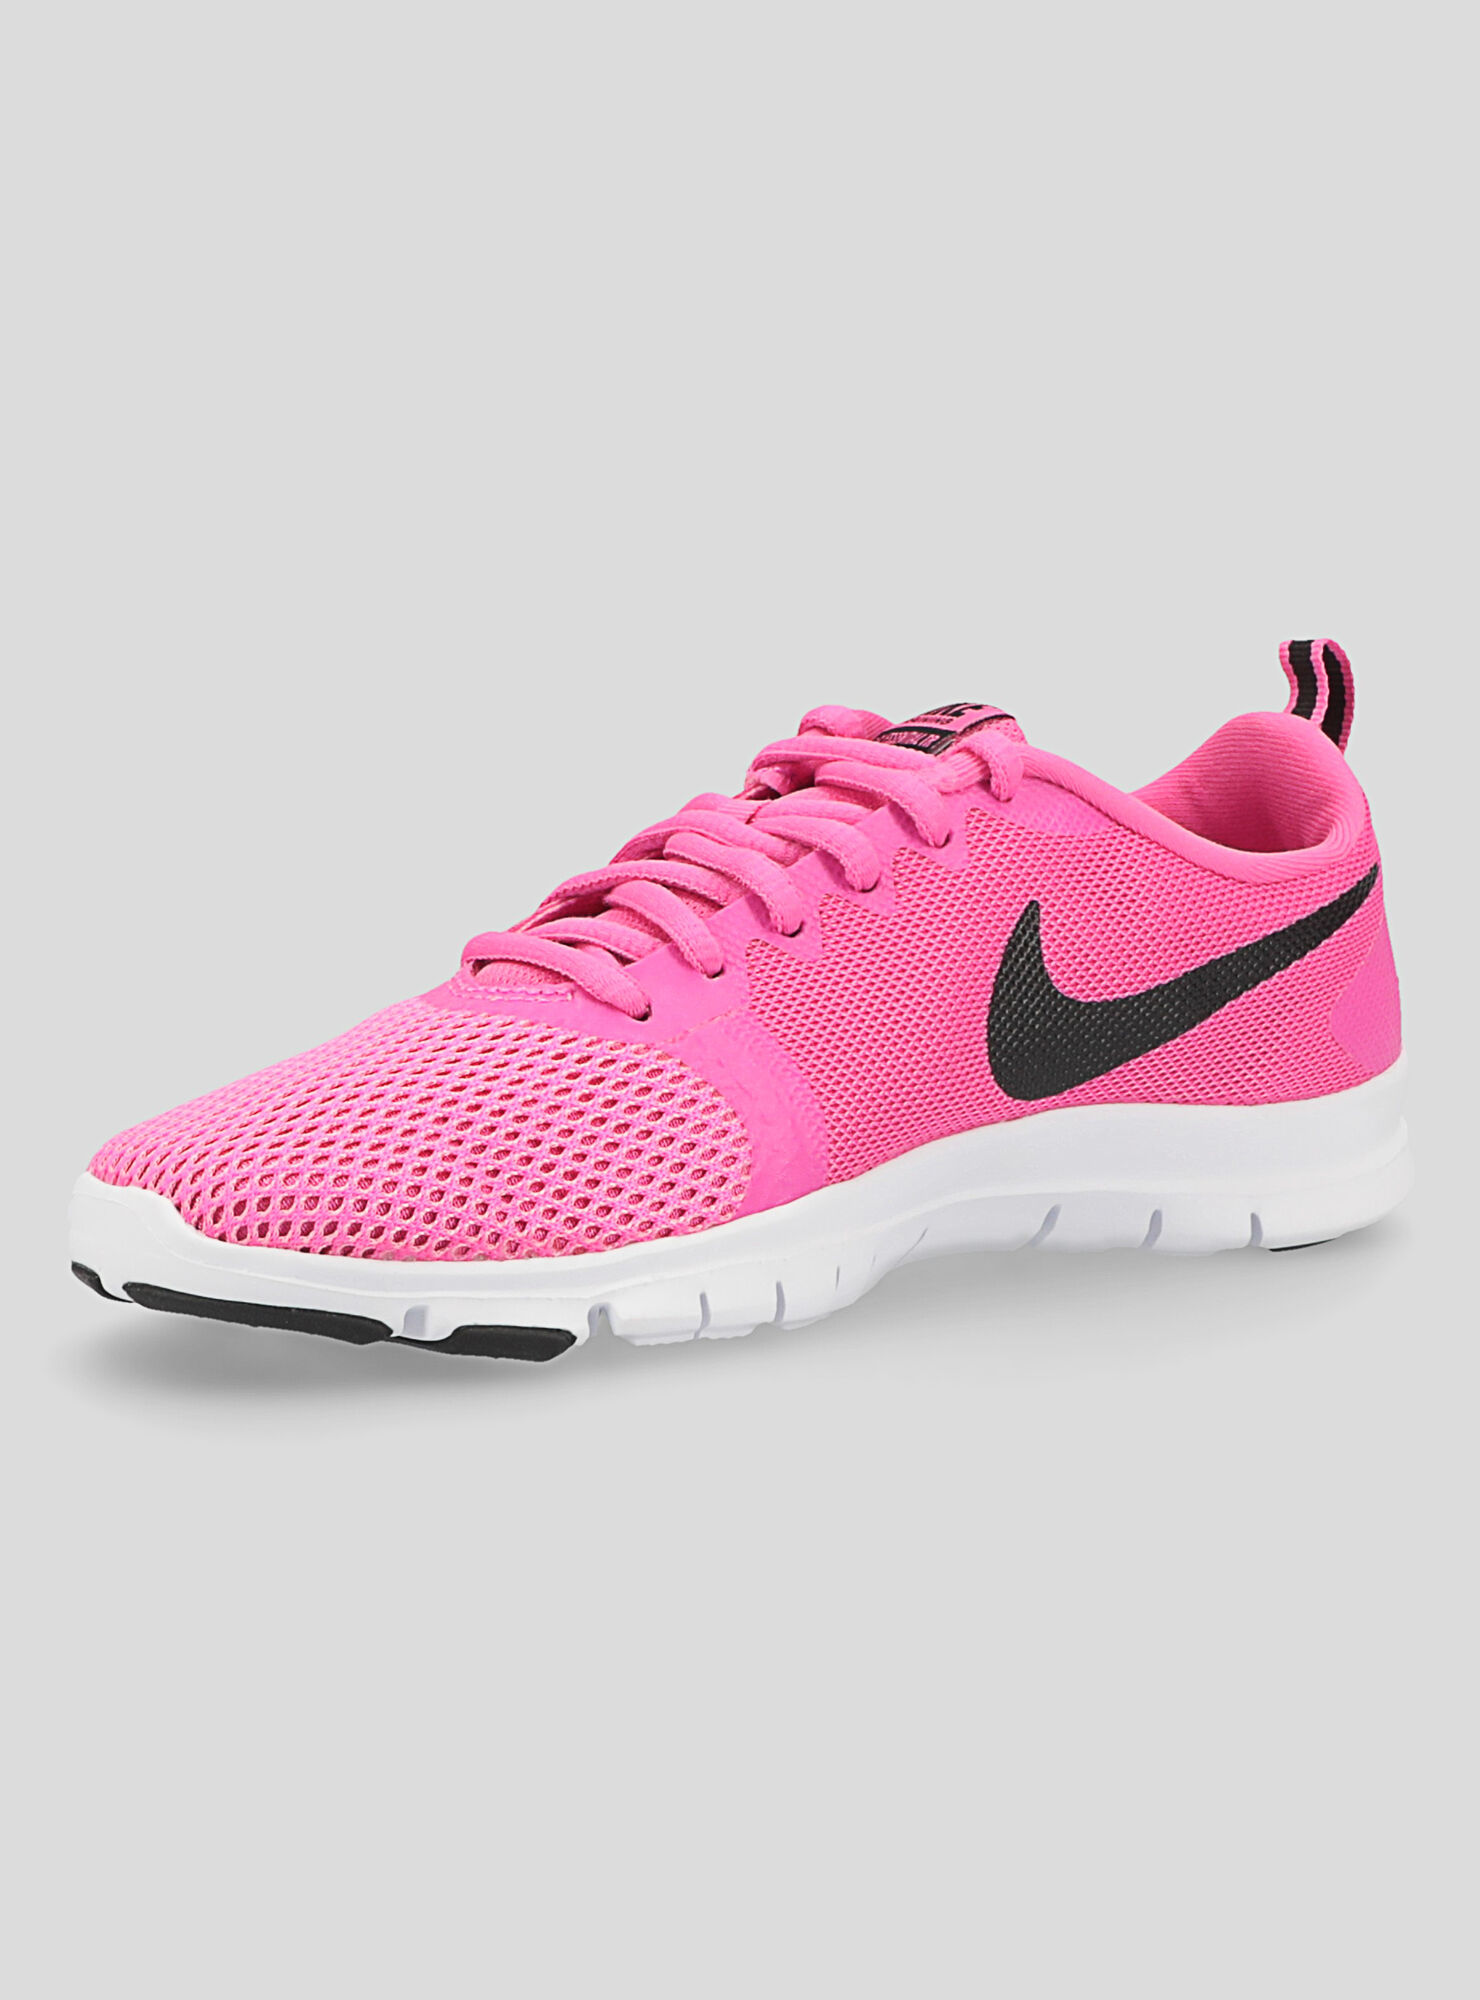 Boutique en ligne 58ba8 31136 Zapatilla Nike Flex Essential Training Mujer